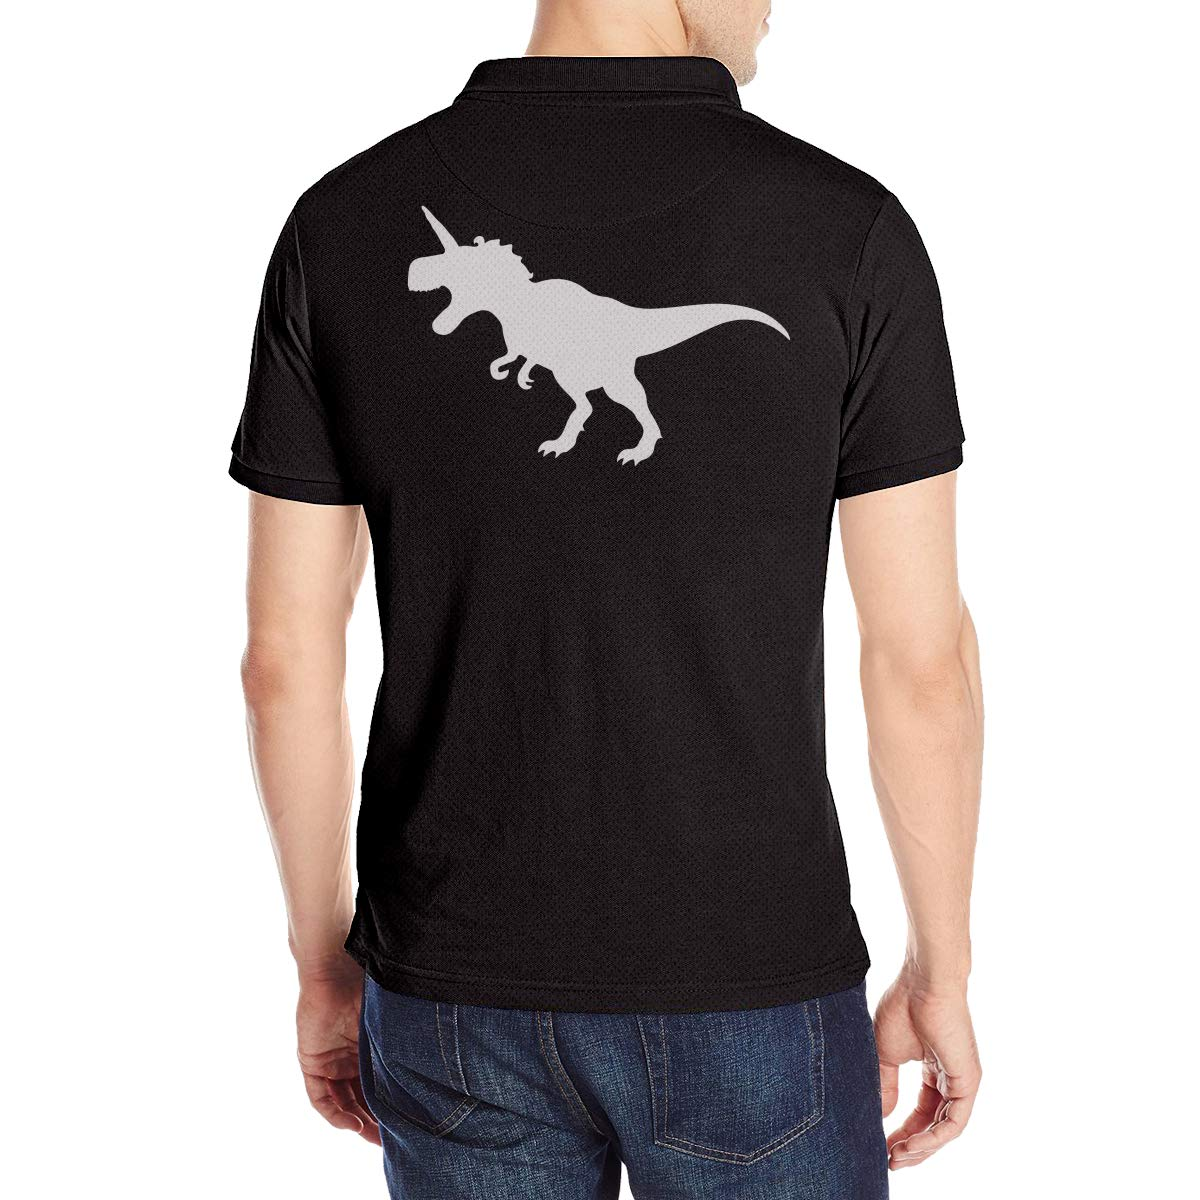 T-rex and Unicorn Mens Short Sleeve Polo Shirt Regular Blouse T-Shirt